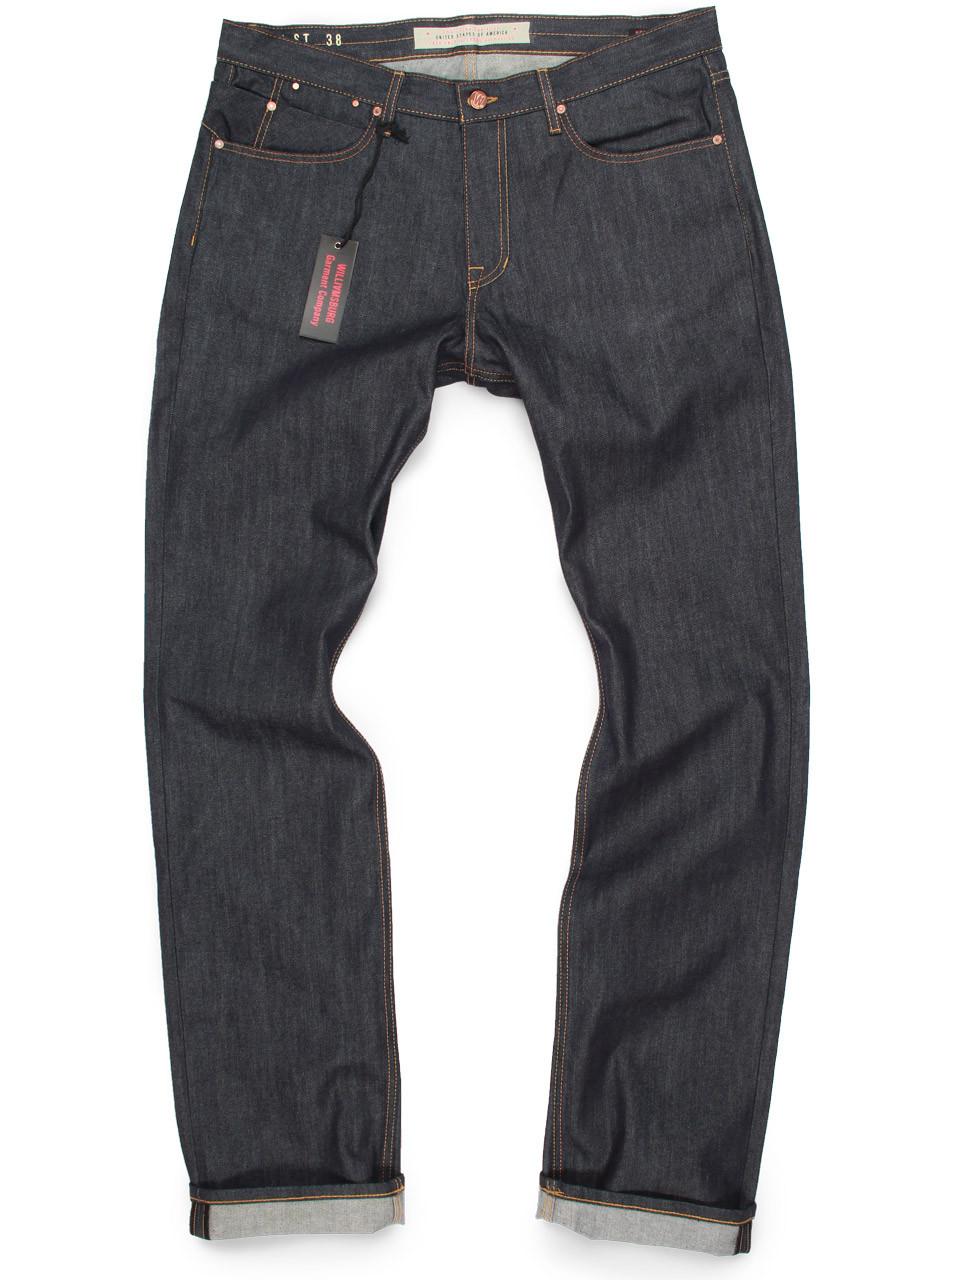 Mens Jeans 33 X 36